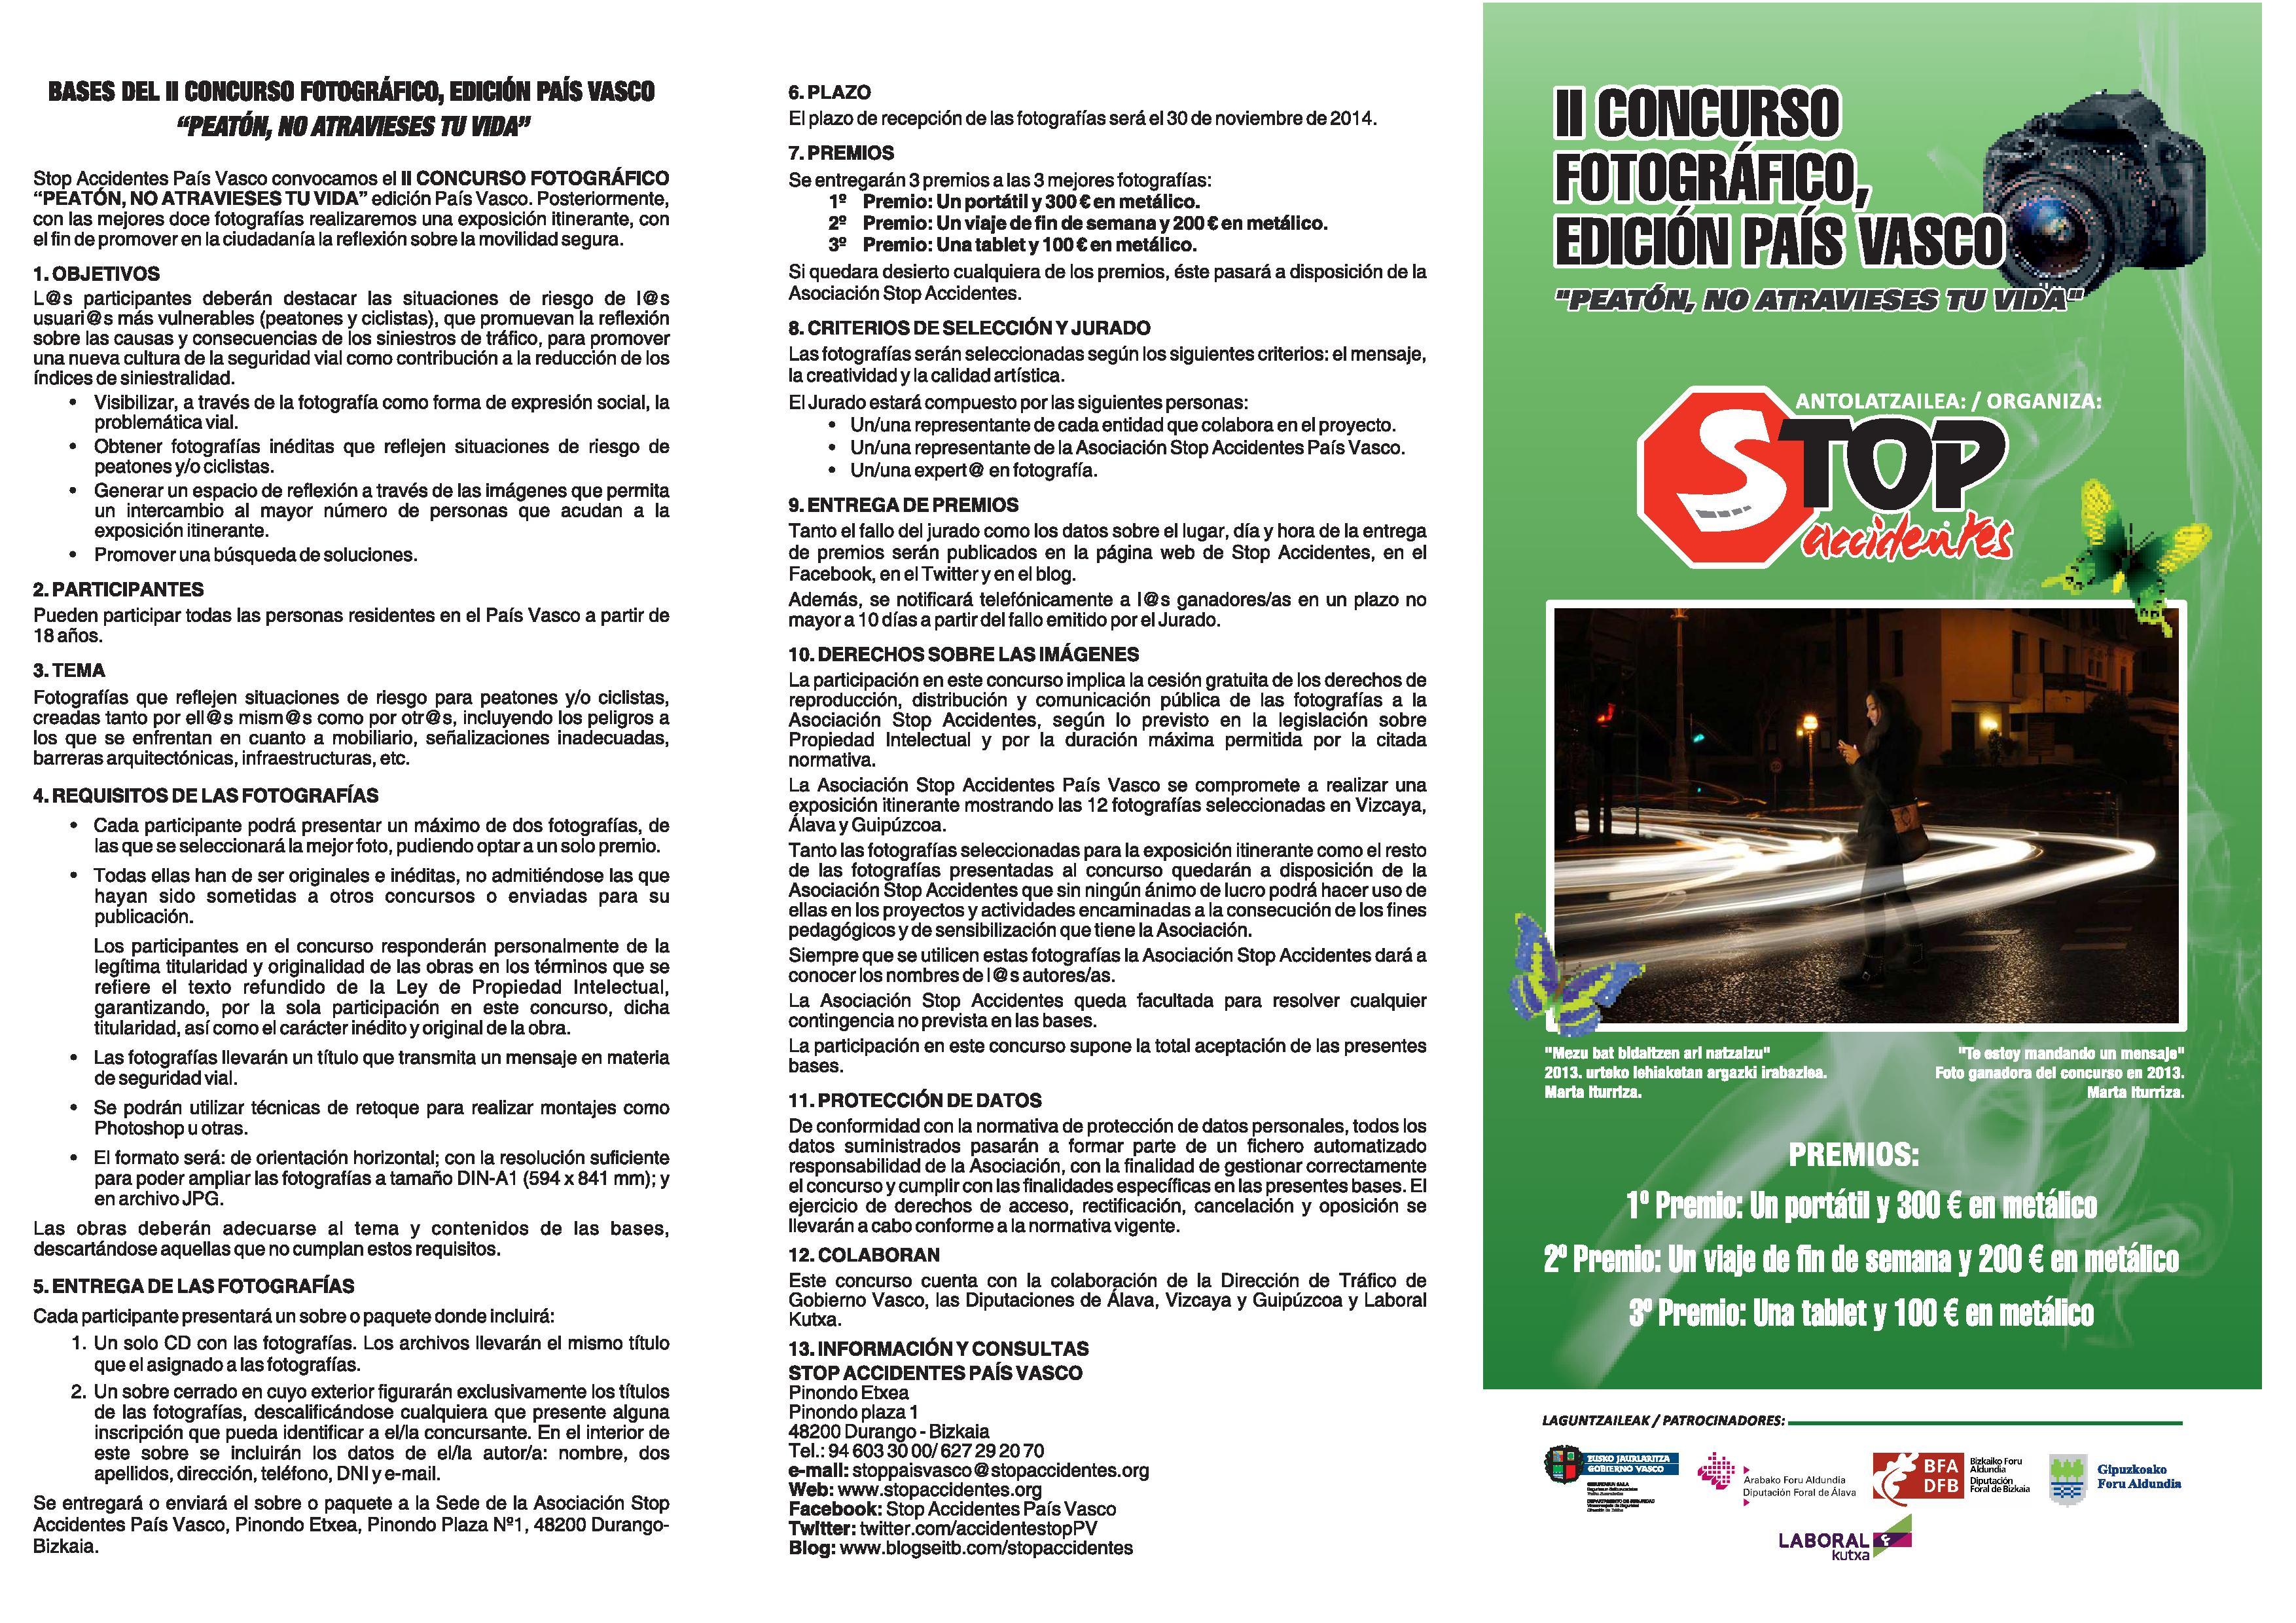 TRIPTICO BASES 2014-page-001